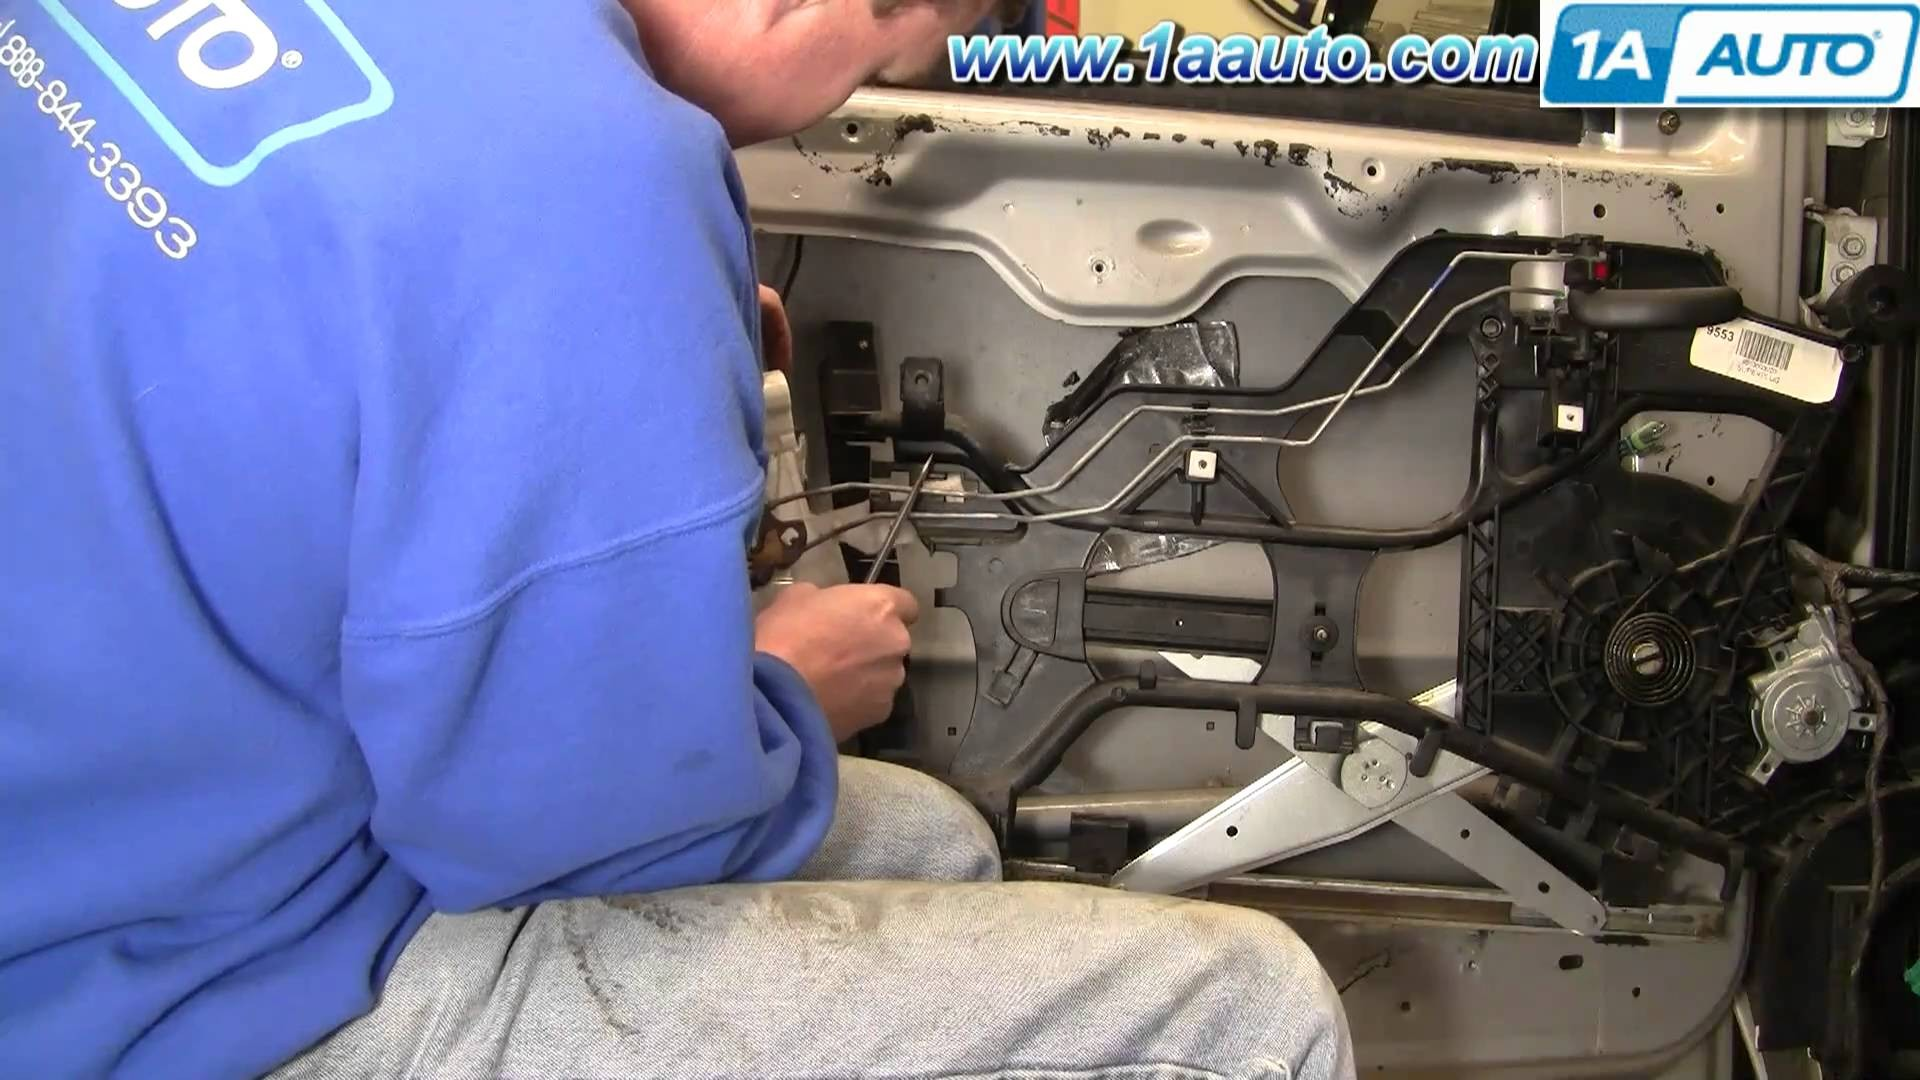 Chevy Venture Engine Diagram How to Install Replace Power Door Lock Actuator Chevy Venture Of Chevy Venture Engine Diagram